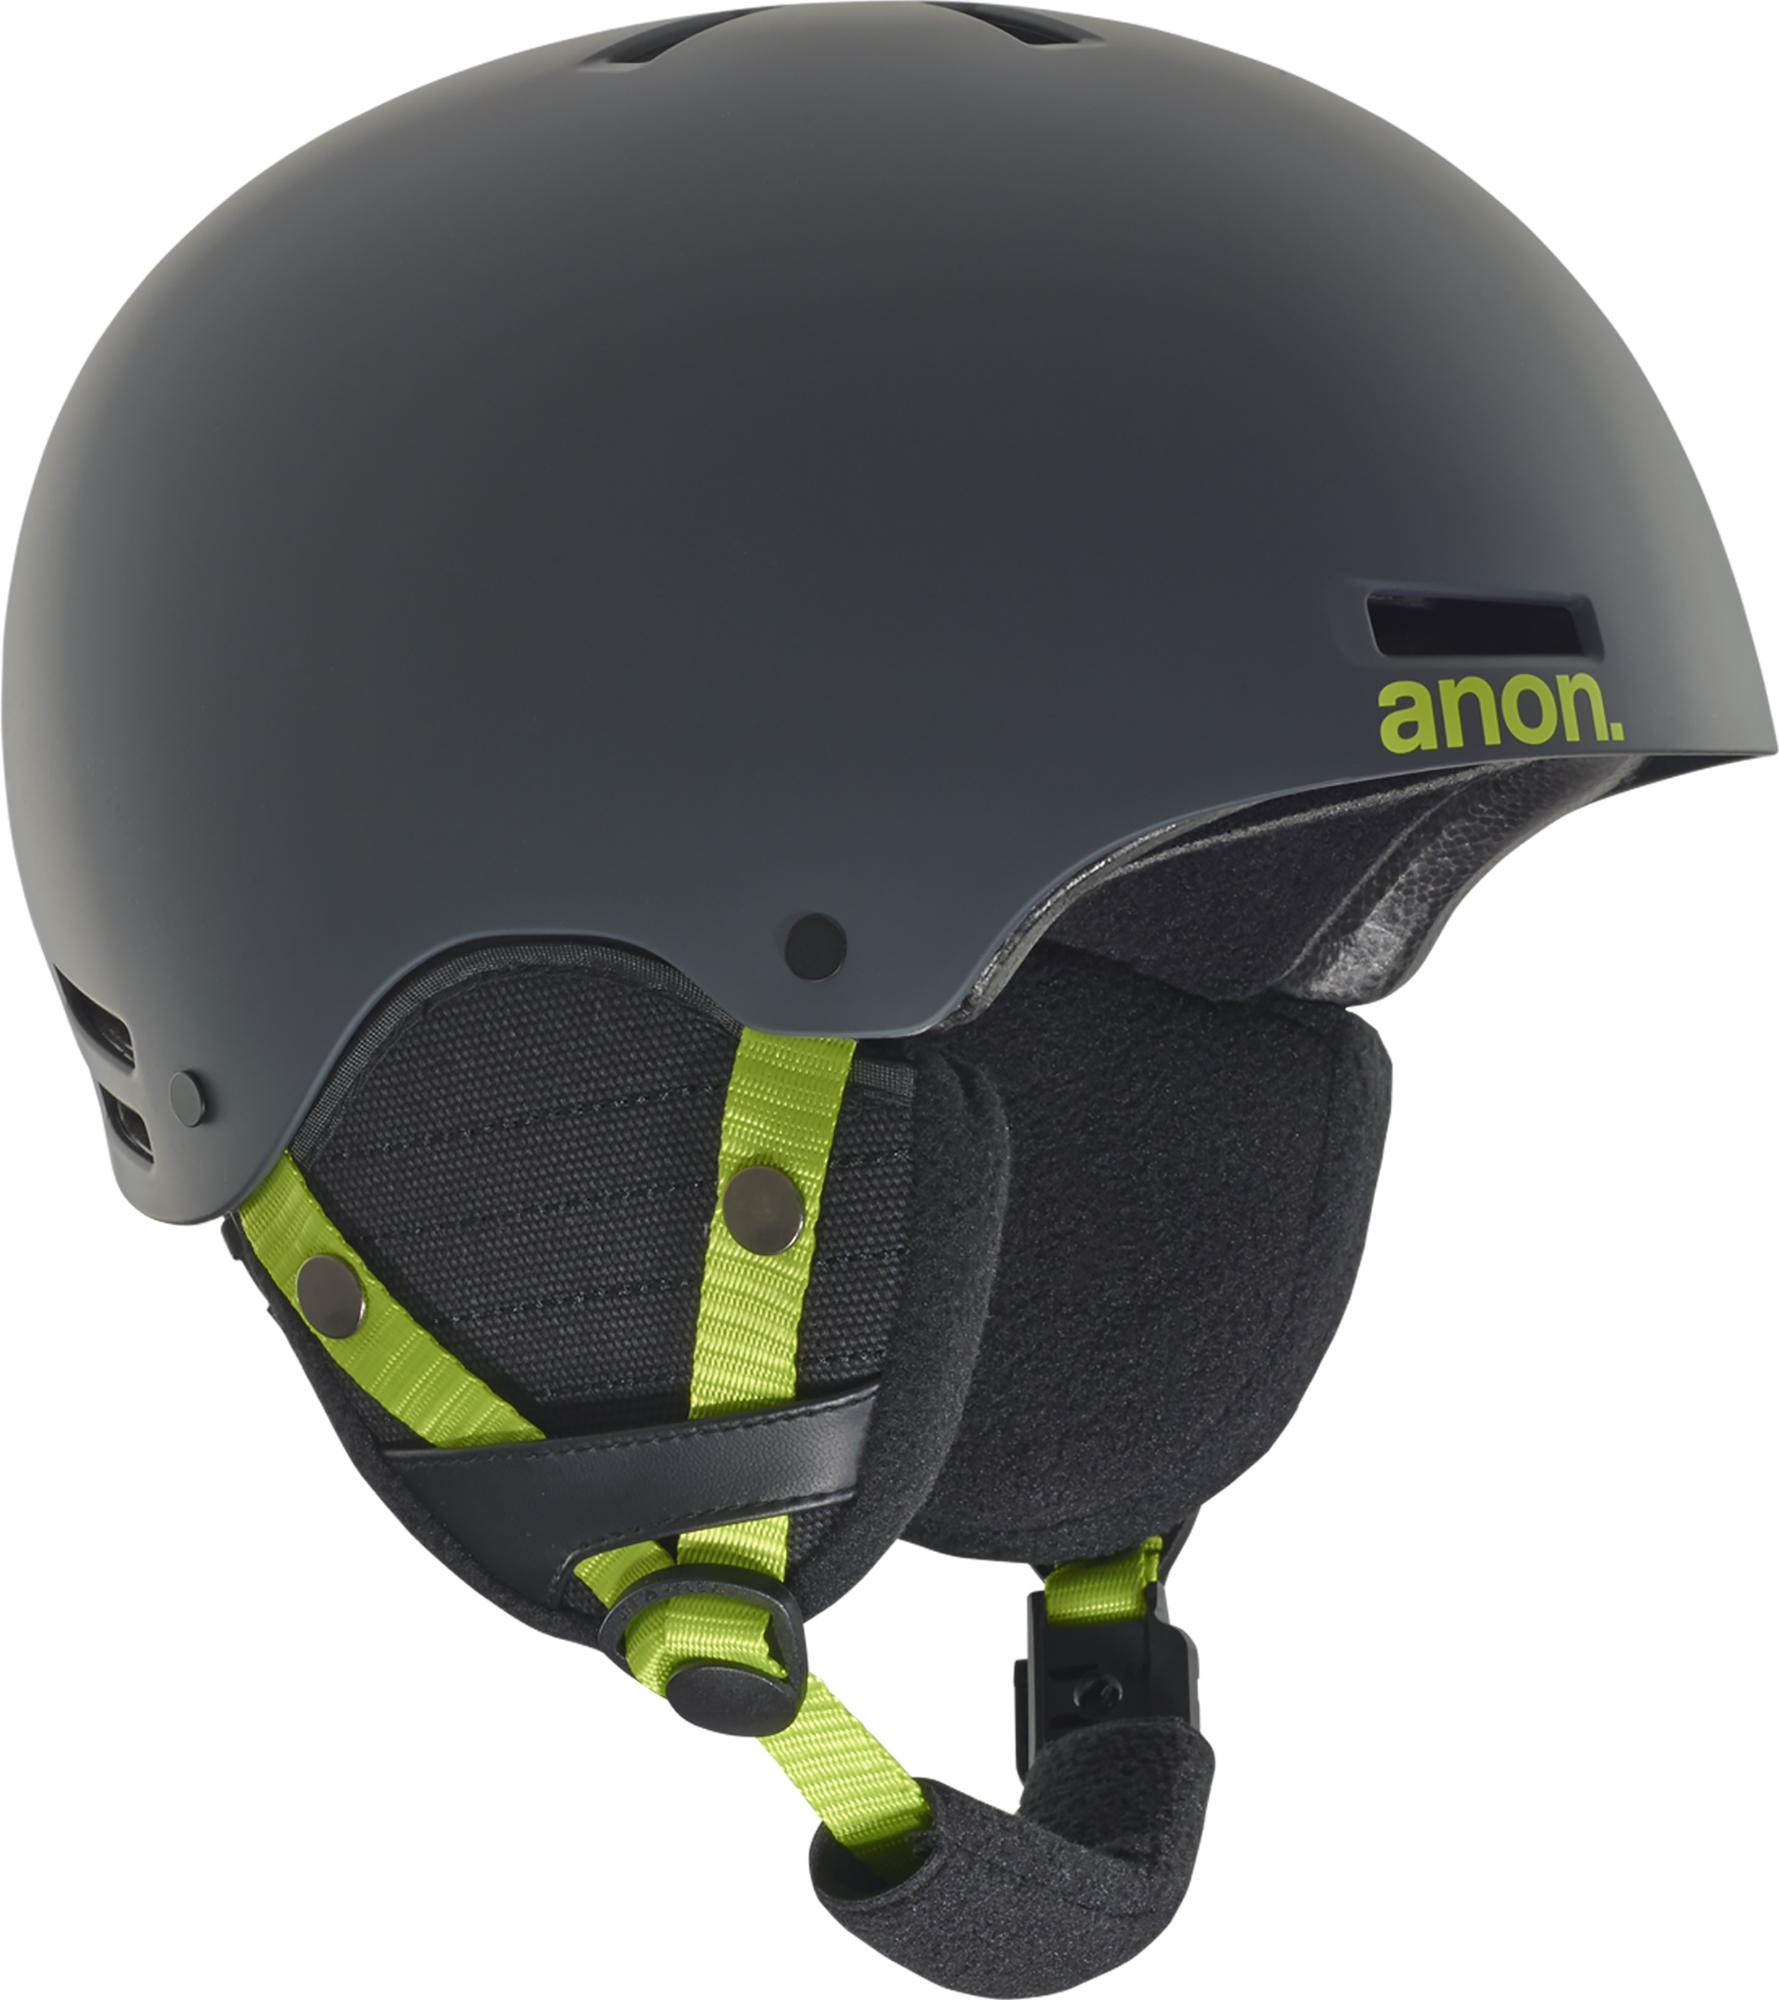 Anon Шлем детский Anon Rime, размер 56-58 шлем для мотоциклистов taiwan syc e 111 3 4 syc abs